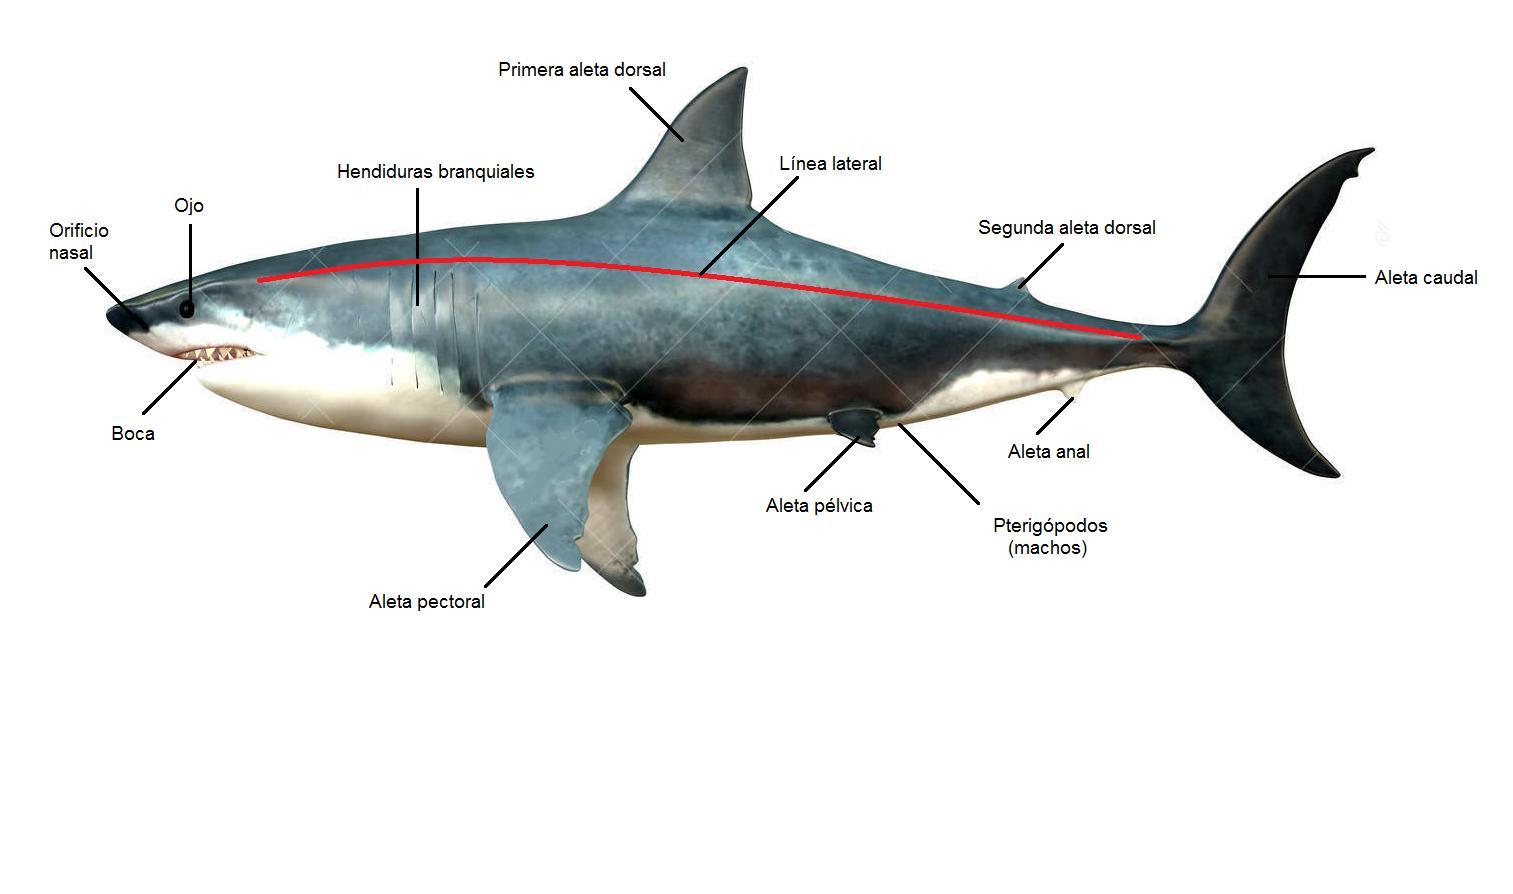 Barcelona Aquarium Sharks: Morfología externa